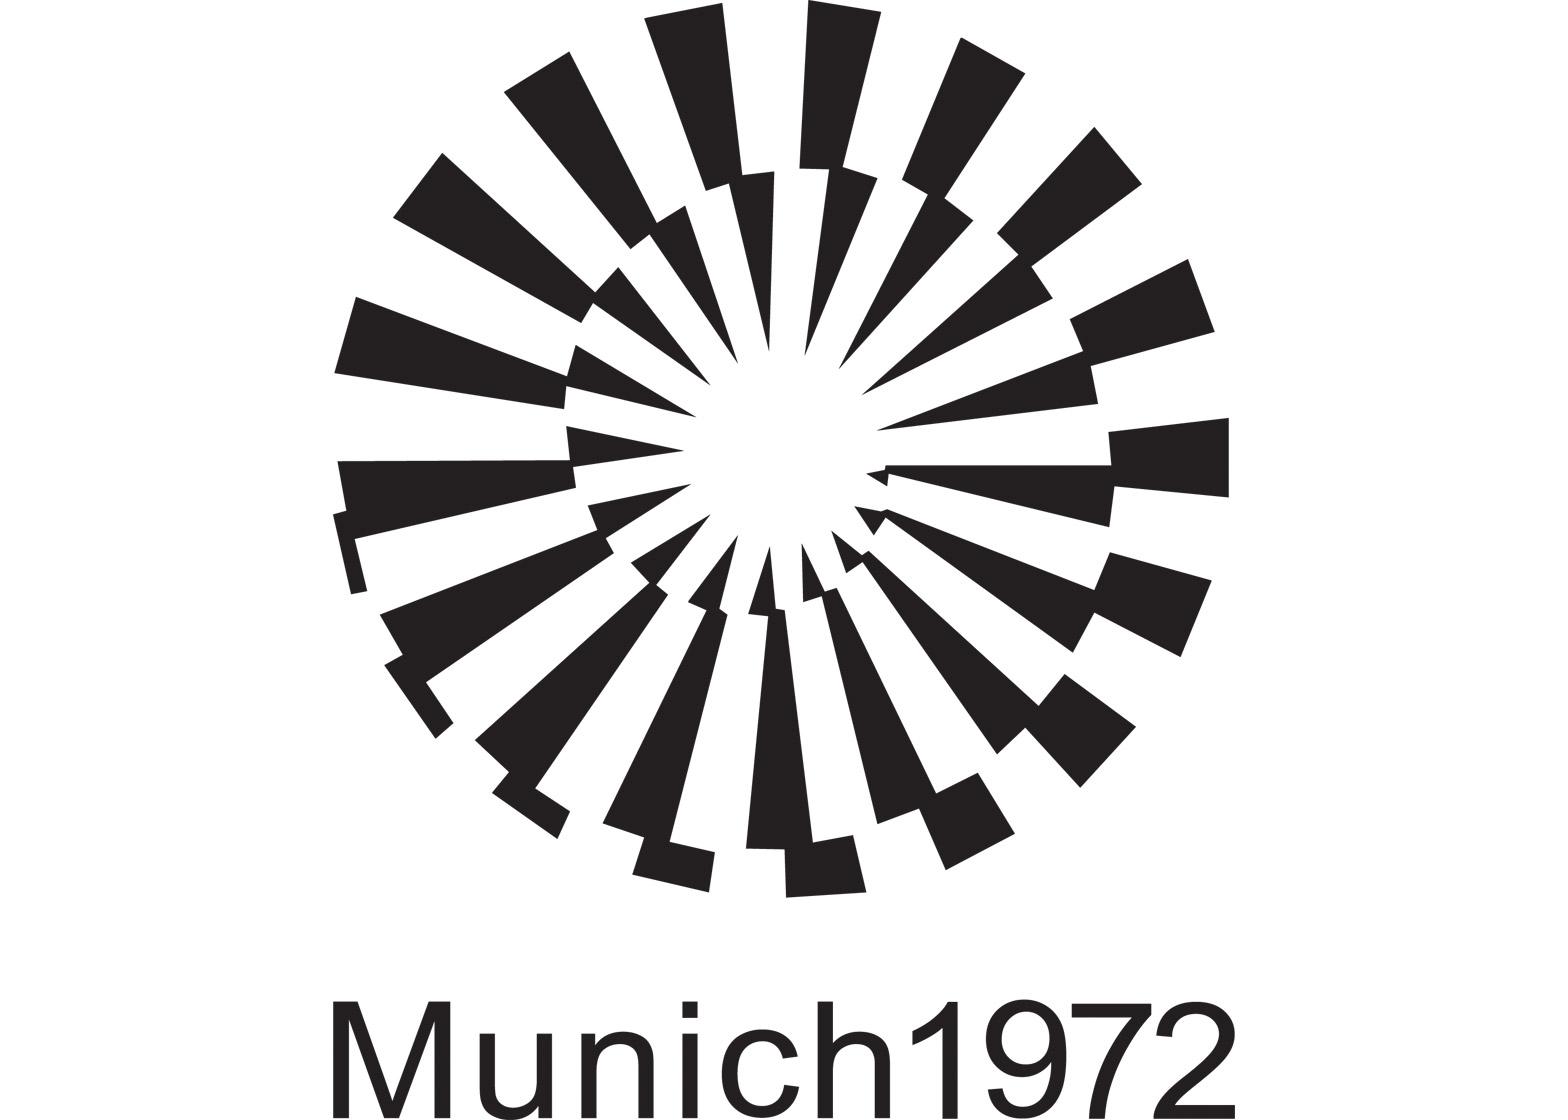 Logo of the 1972 Munich Olympics